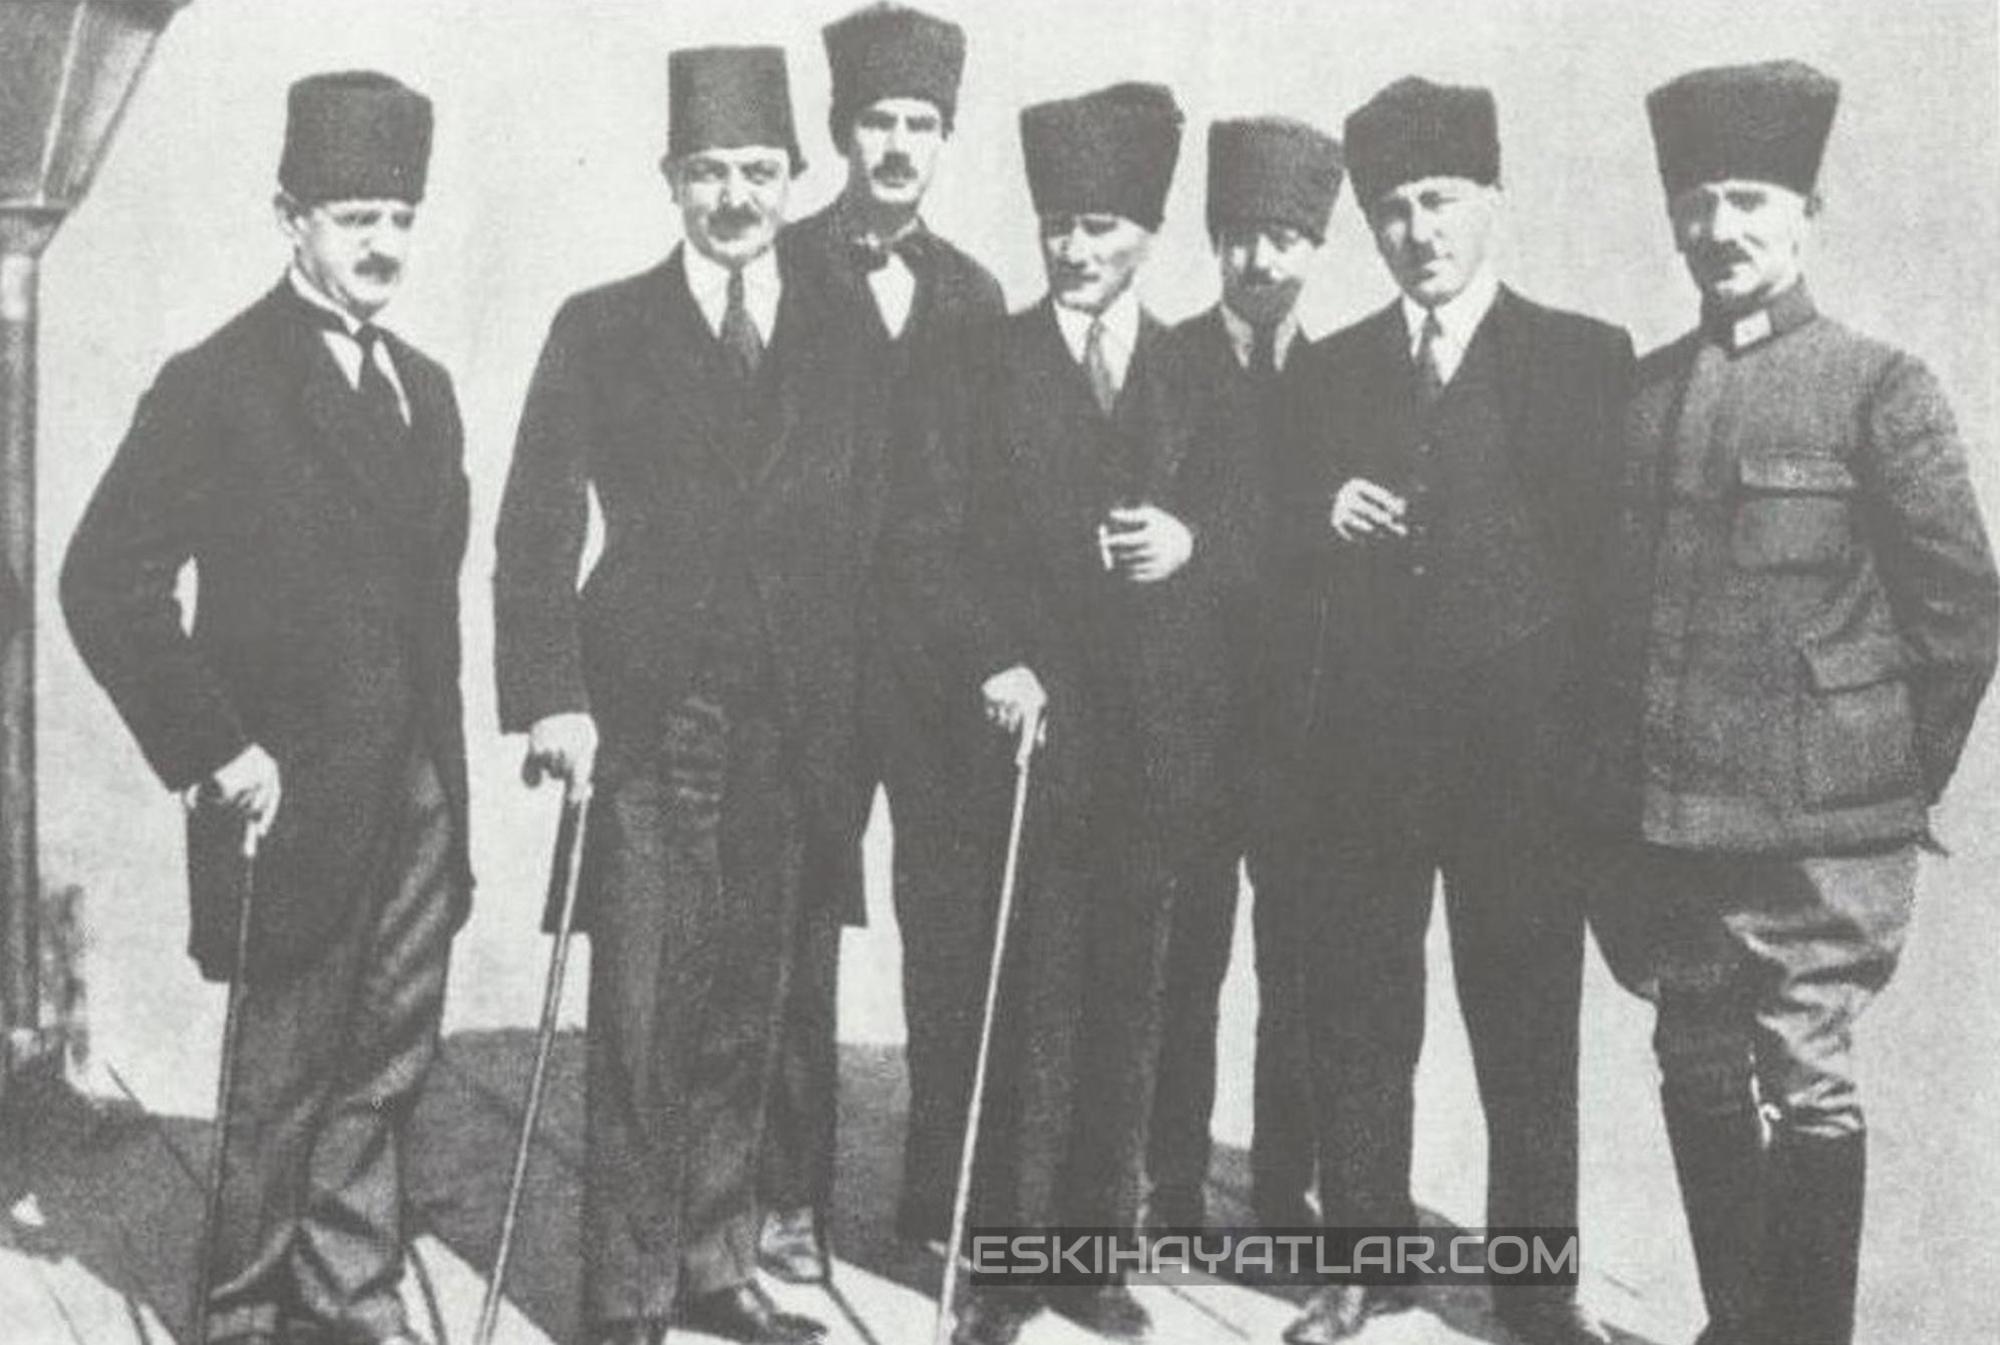 ataturk-izmir-gunleri-mustafa-kemal-pasa-1922-izmir-fotograflari (2)